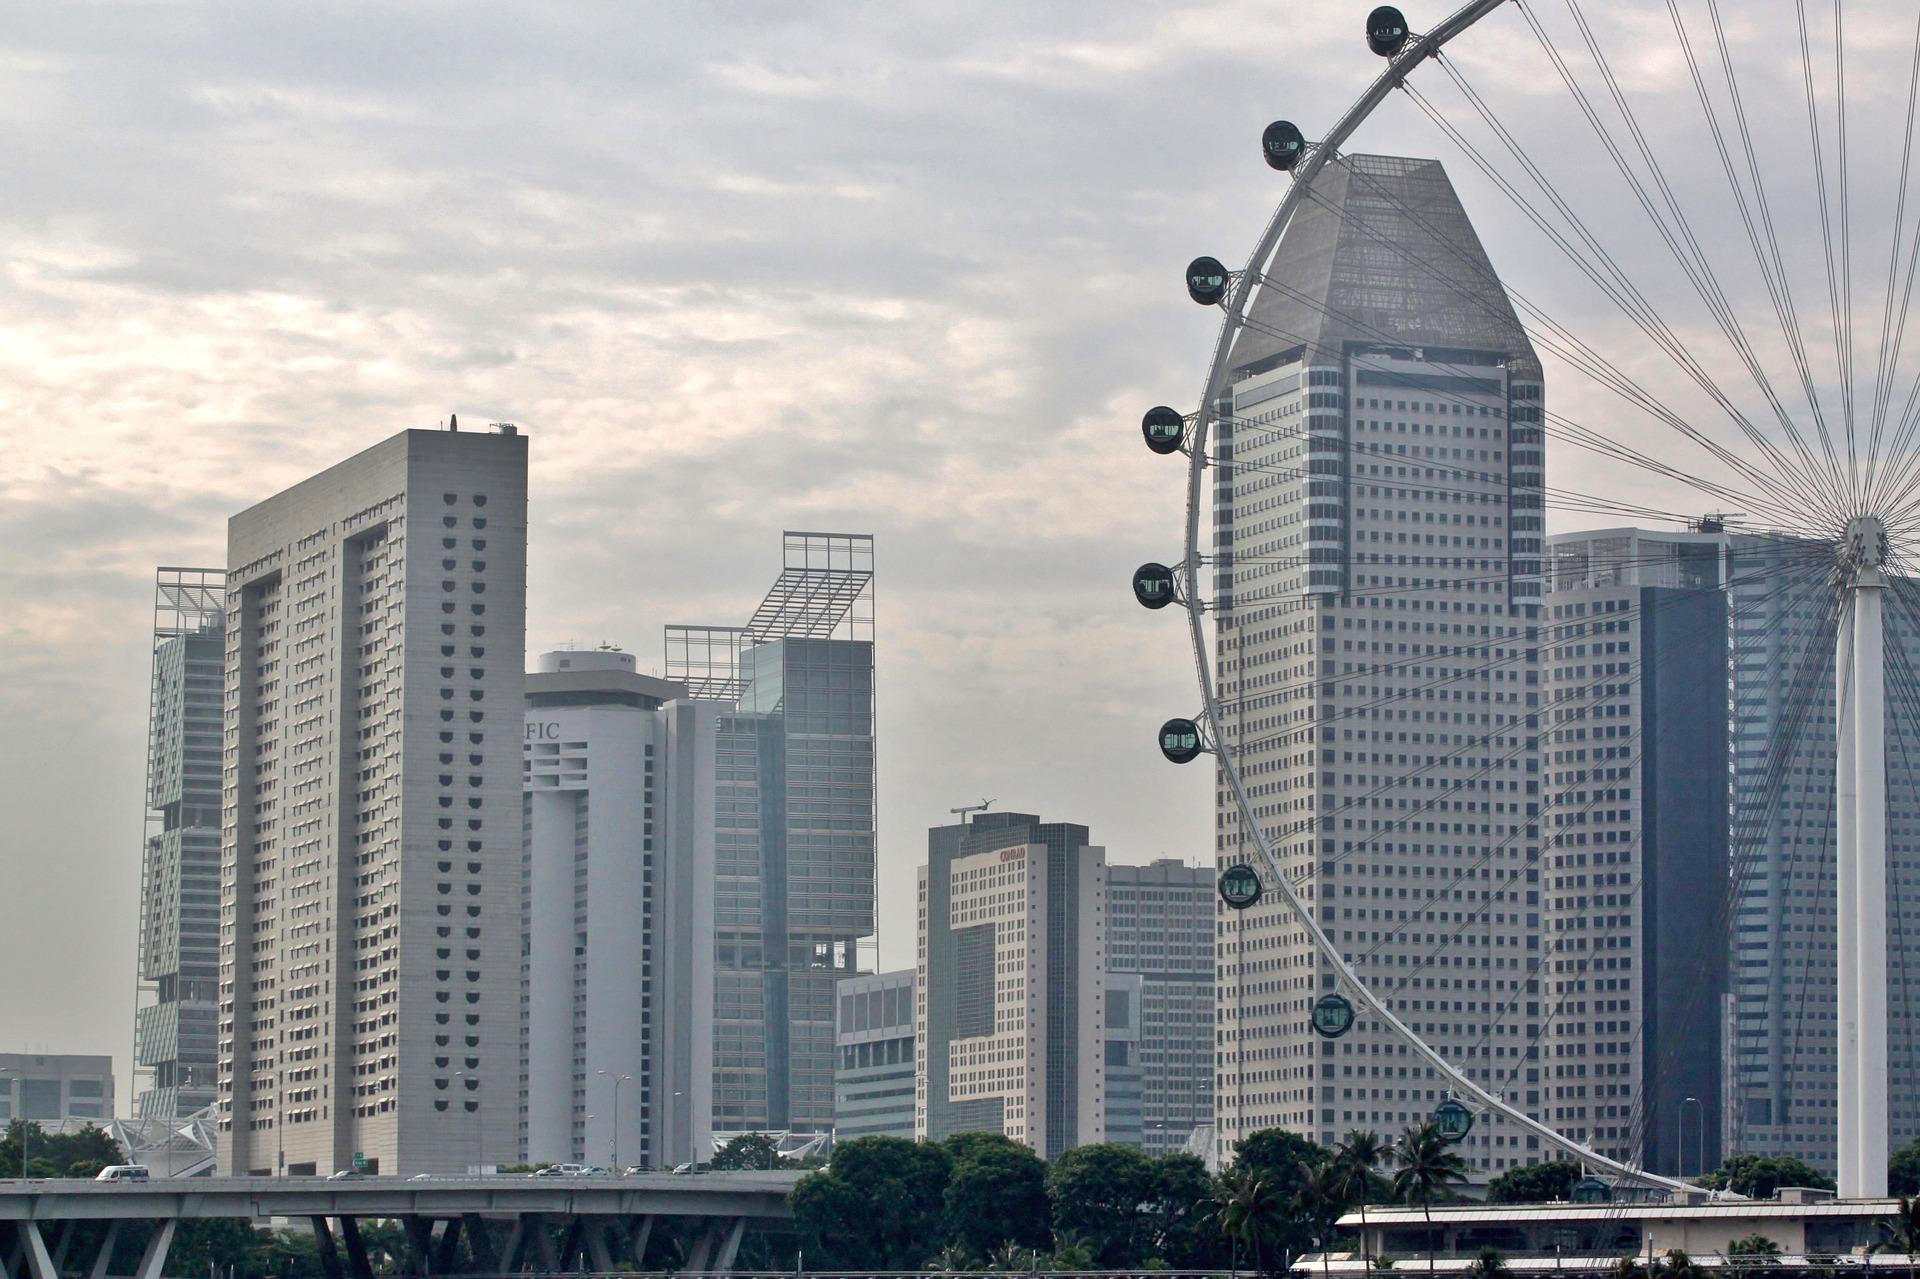 singapore-989047_1920